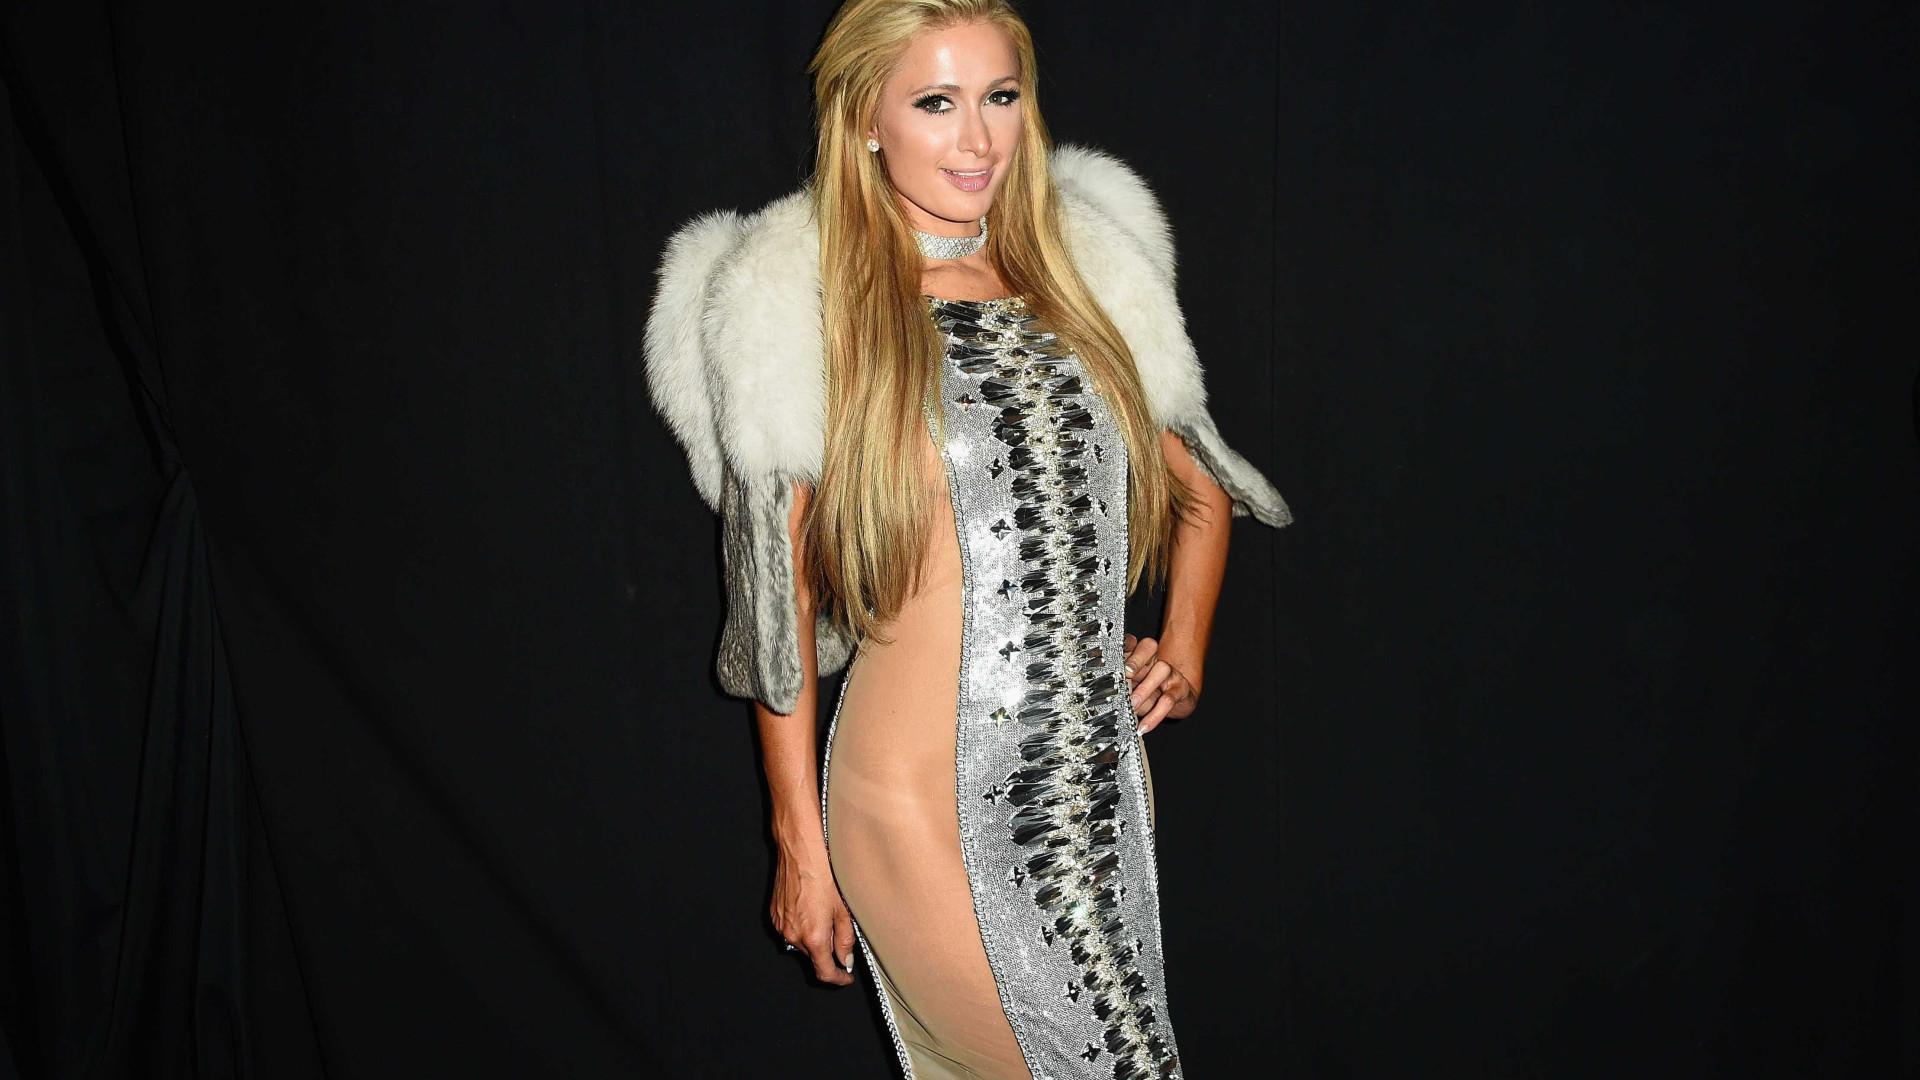 Acusações de assédio sexual: Paris Hilton defende Trump